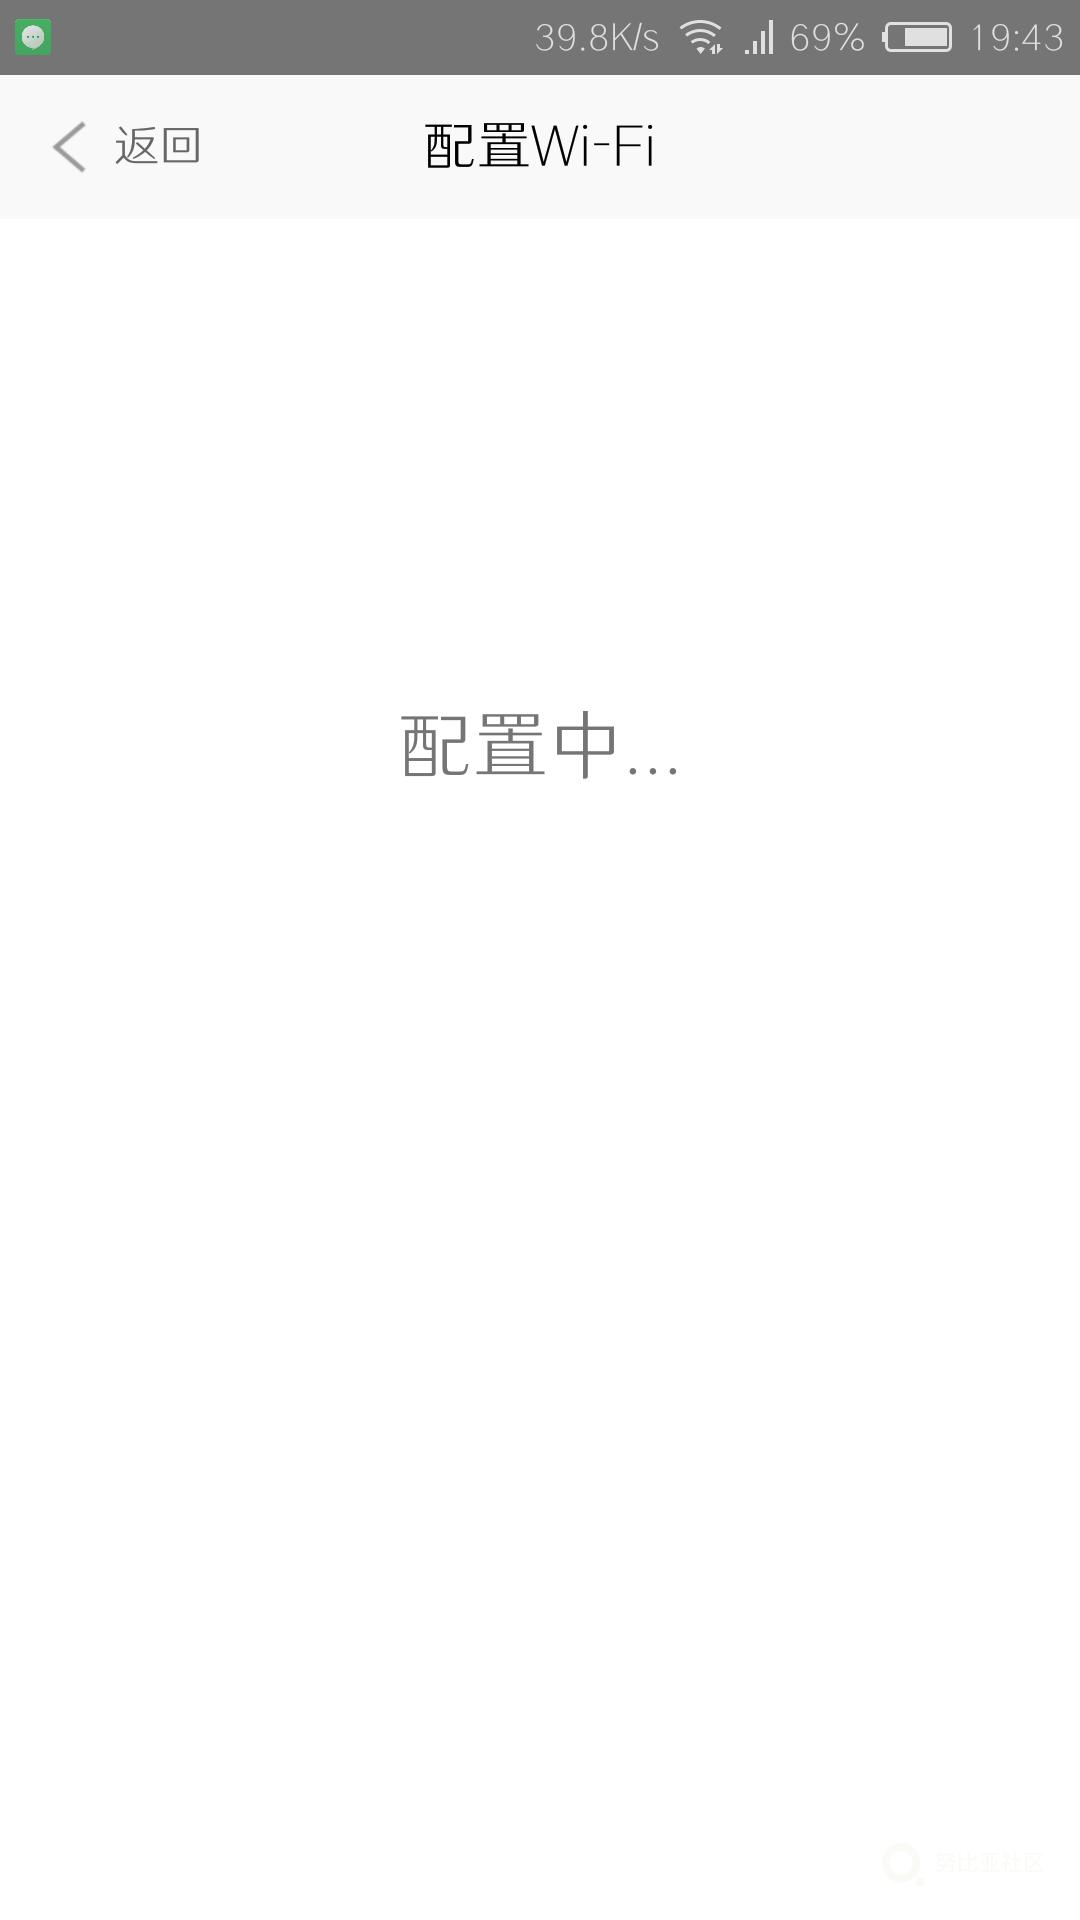 Screenshot_2018-01-25-19-43-51.png